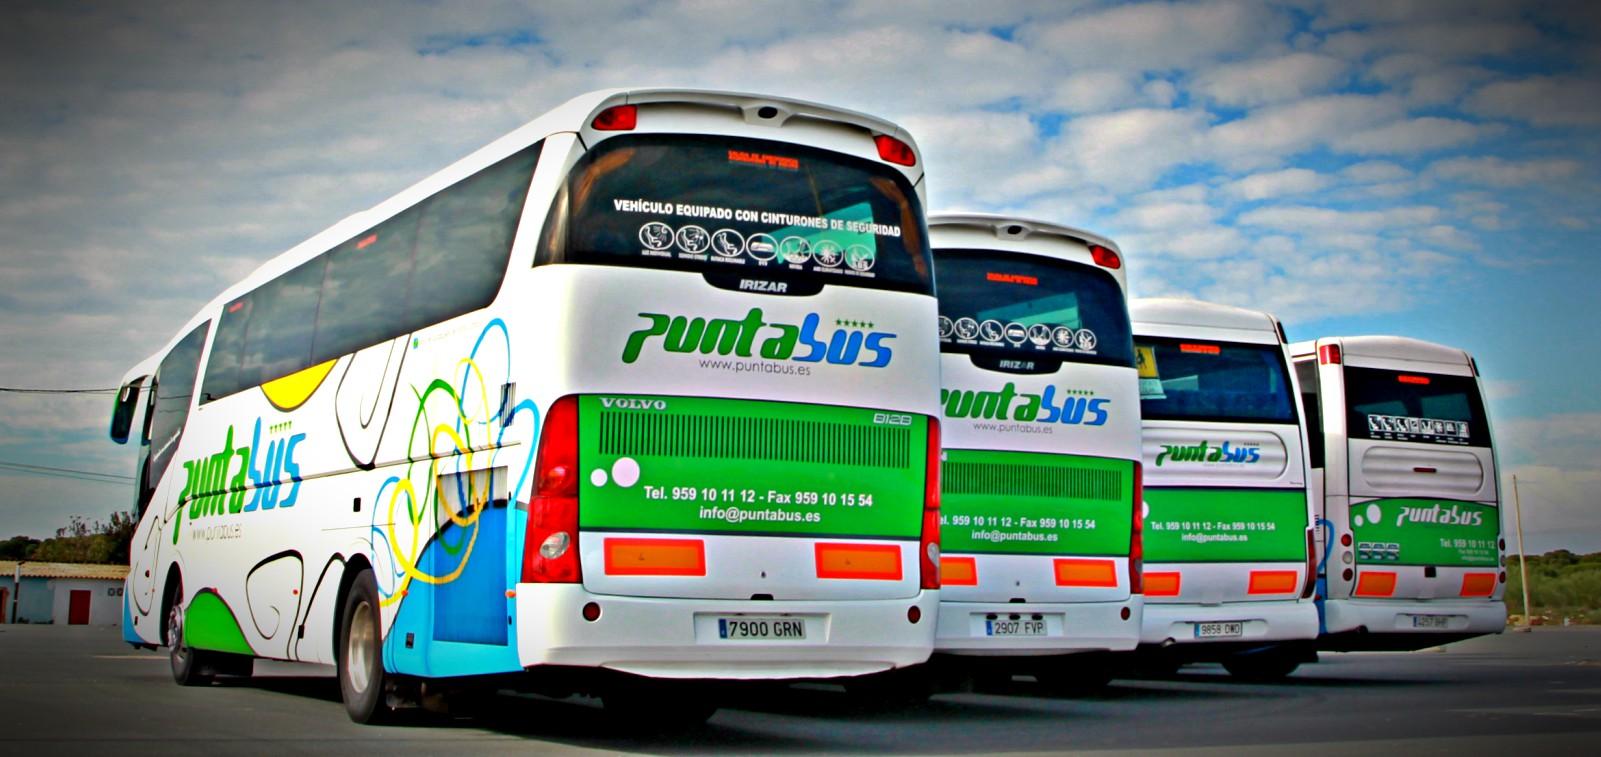 bus company huelva andalucia spain